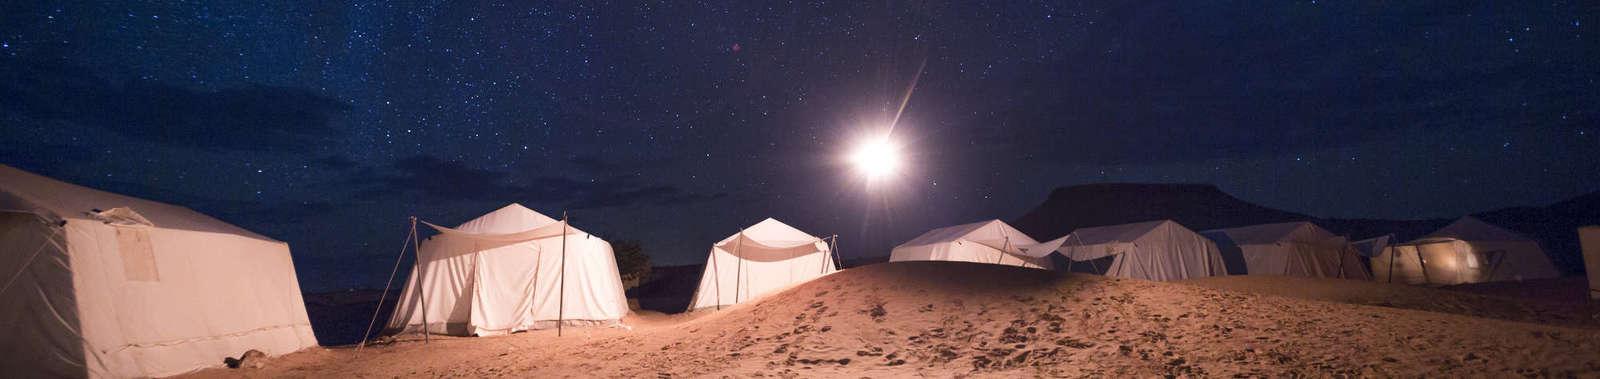 Under the stars at Camp Mars, Grand Erg Oriental, Sahara, Tunisia